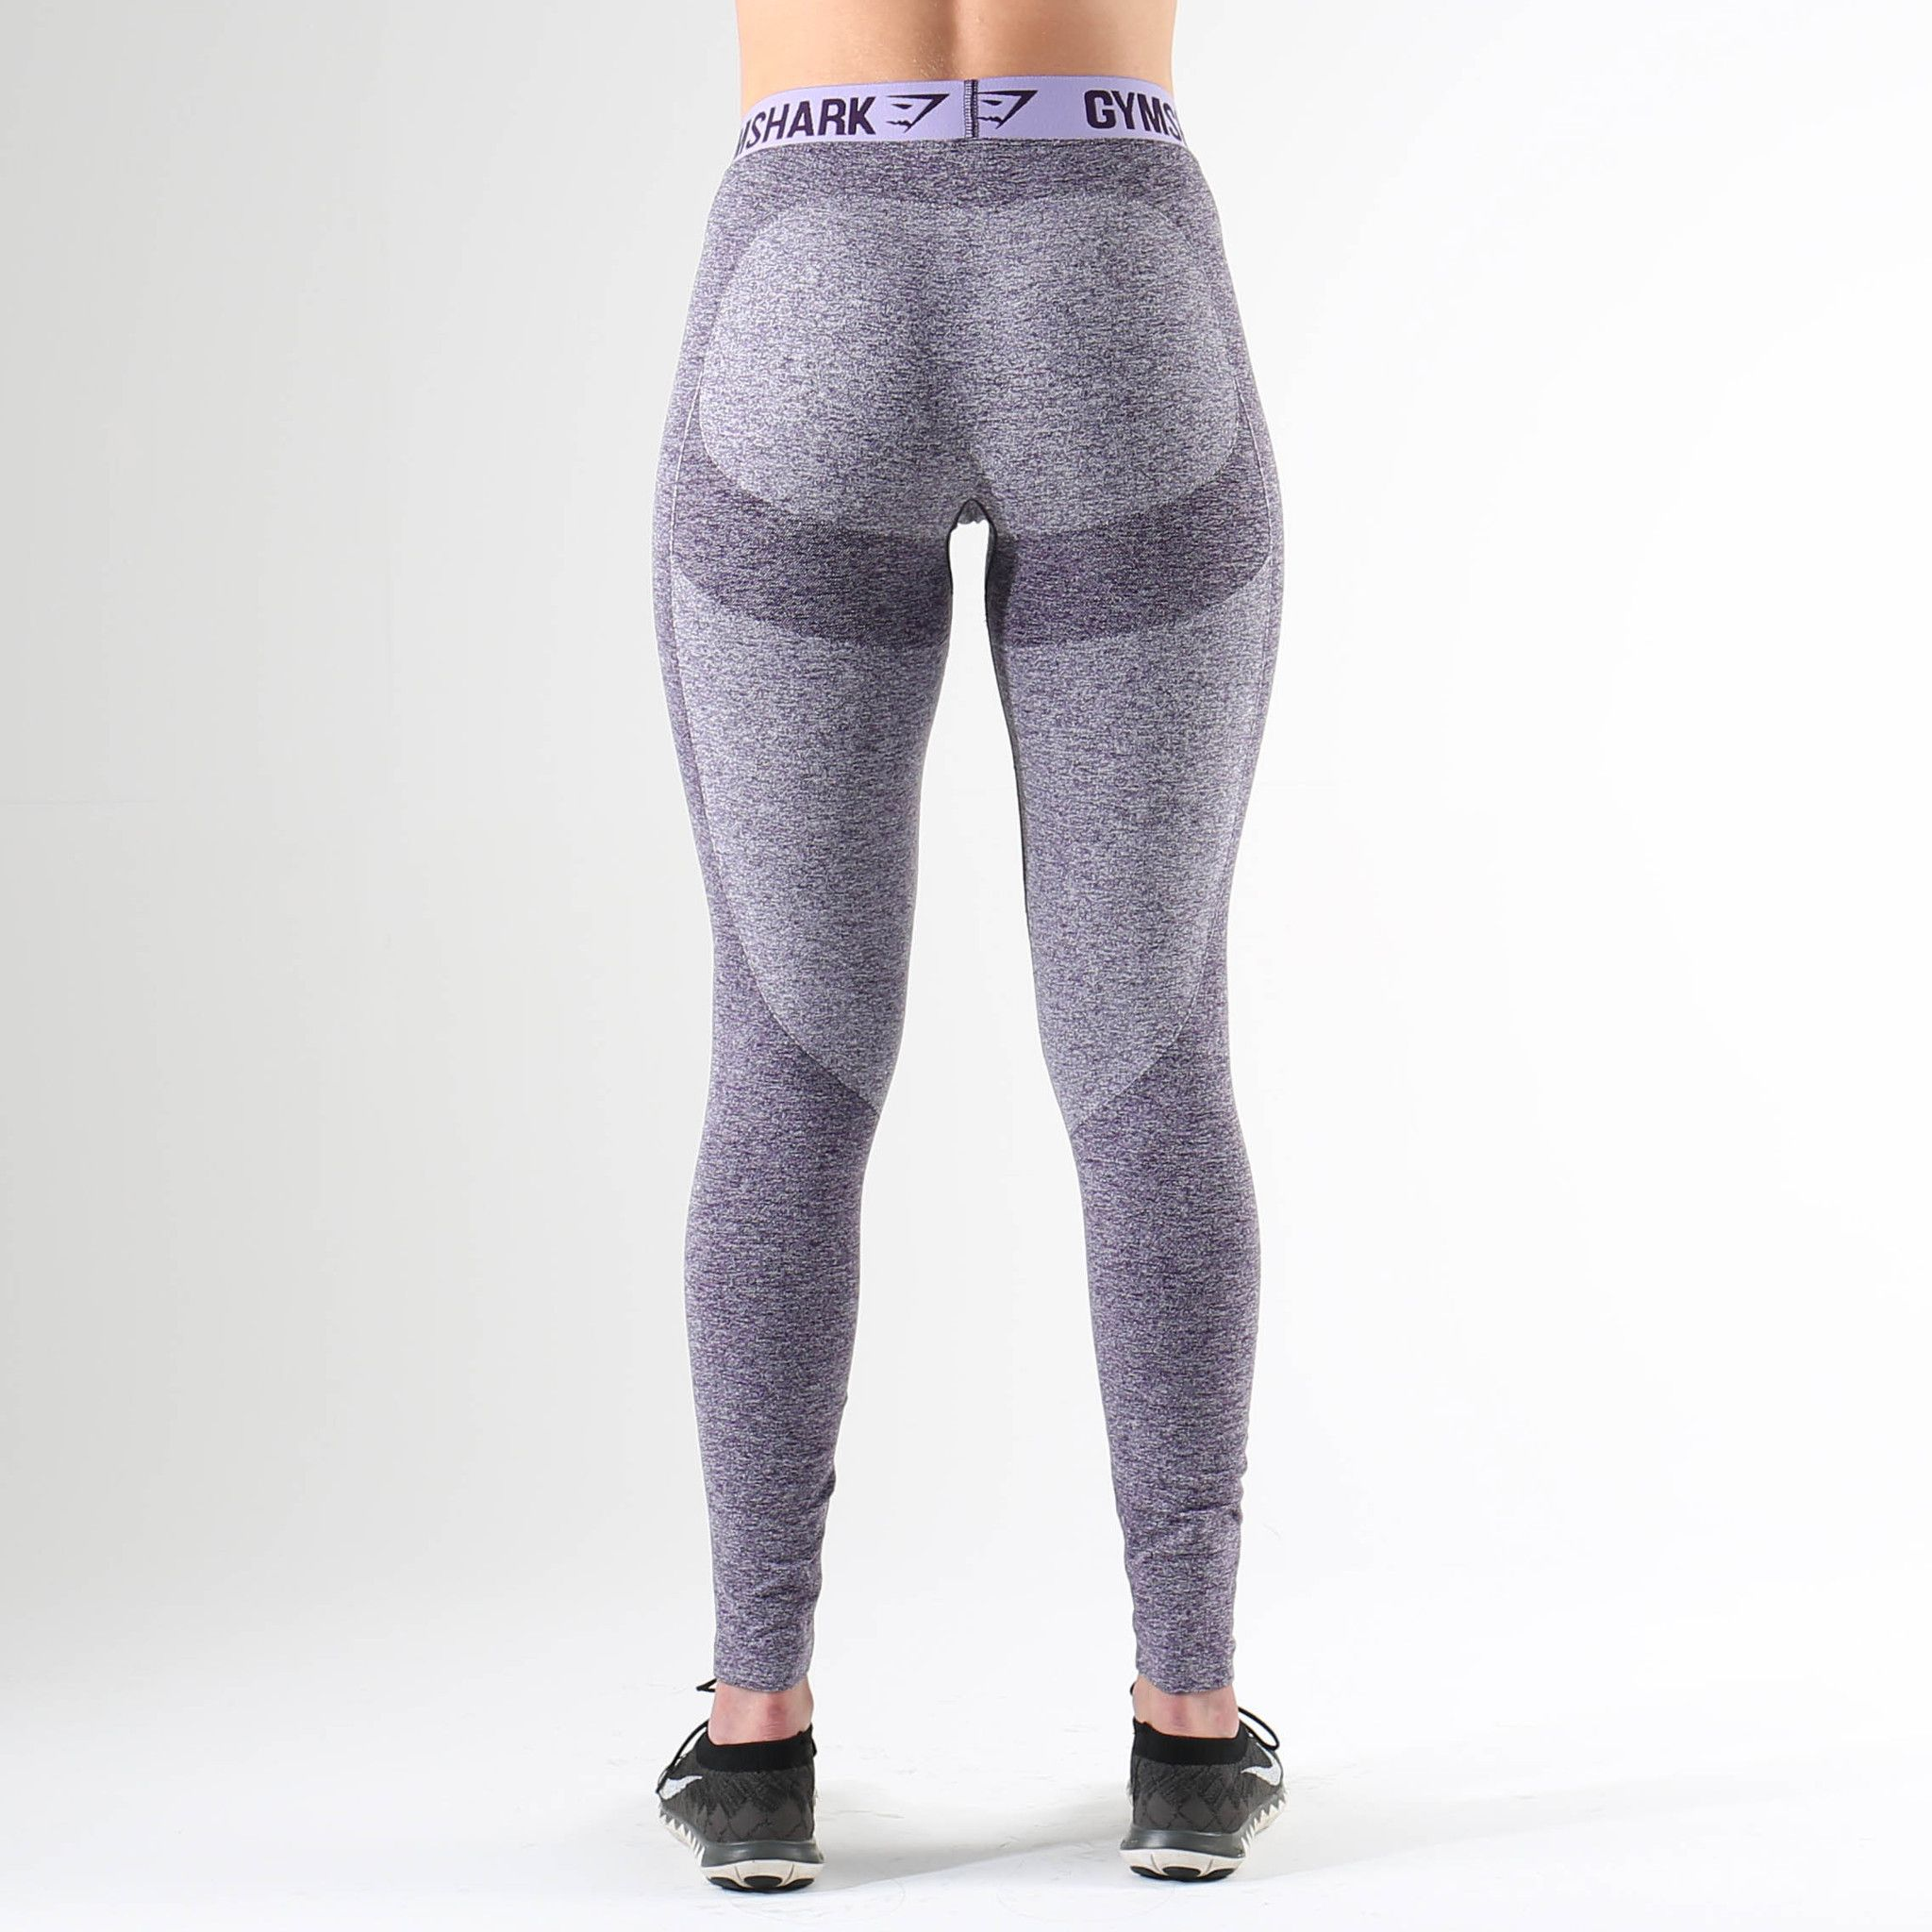 1ace8696f0af0 Gymshark Flex Leggings - Rich Purple Marl/Soft Lilac | fitness ...